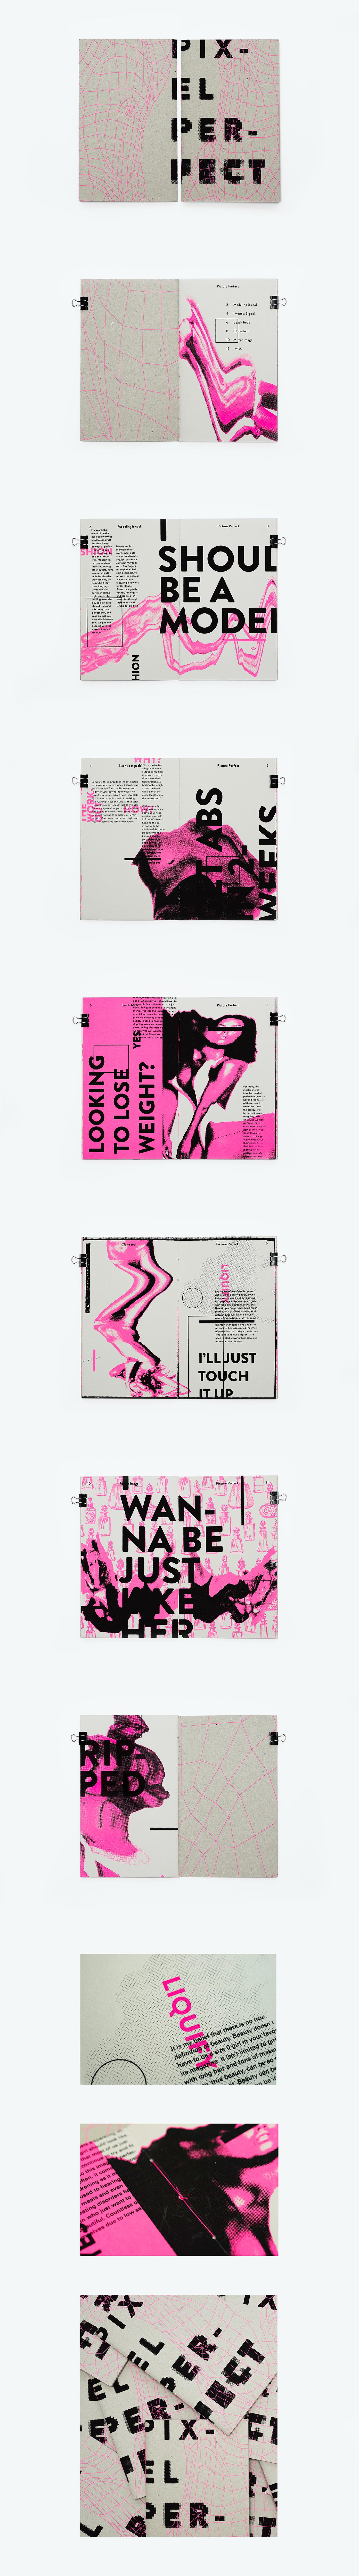 screen printing pink black book magazine Zine  minimal postmodern saddle stitch neon flourescent small hand made distortion